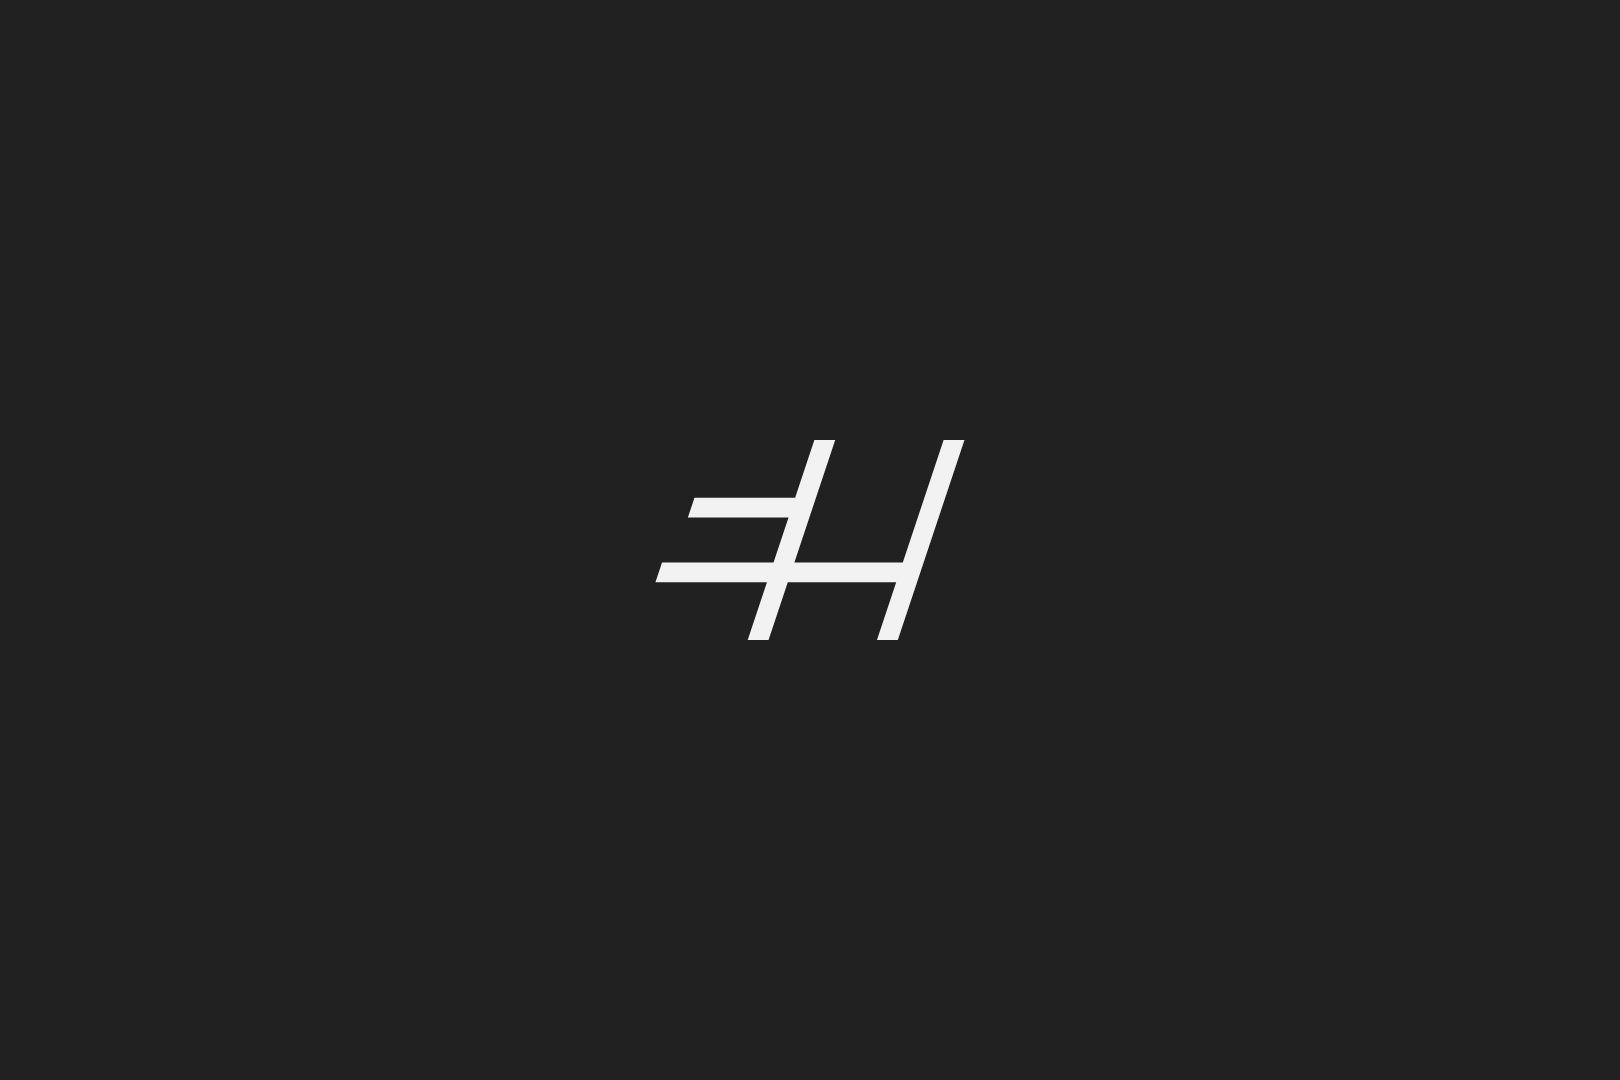 Eh Monogram Logo In 2020 Monogram Logo Typography Alphabet Real Estate Logo Design